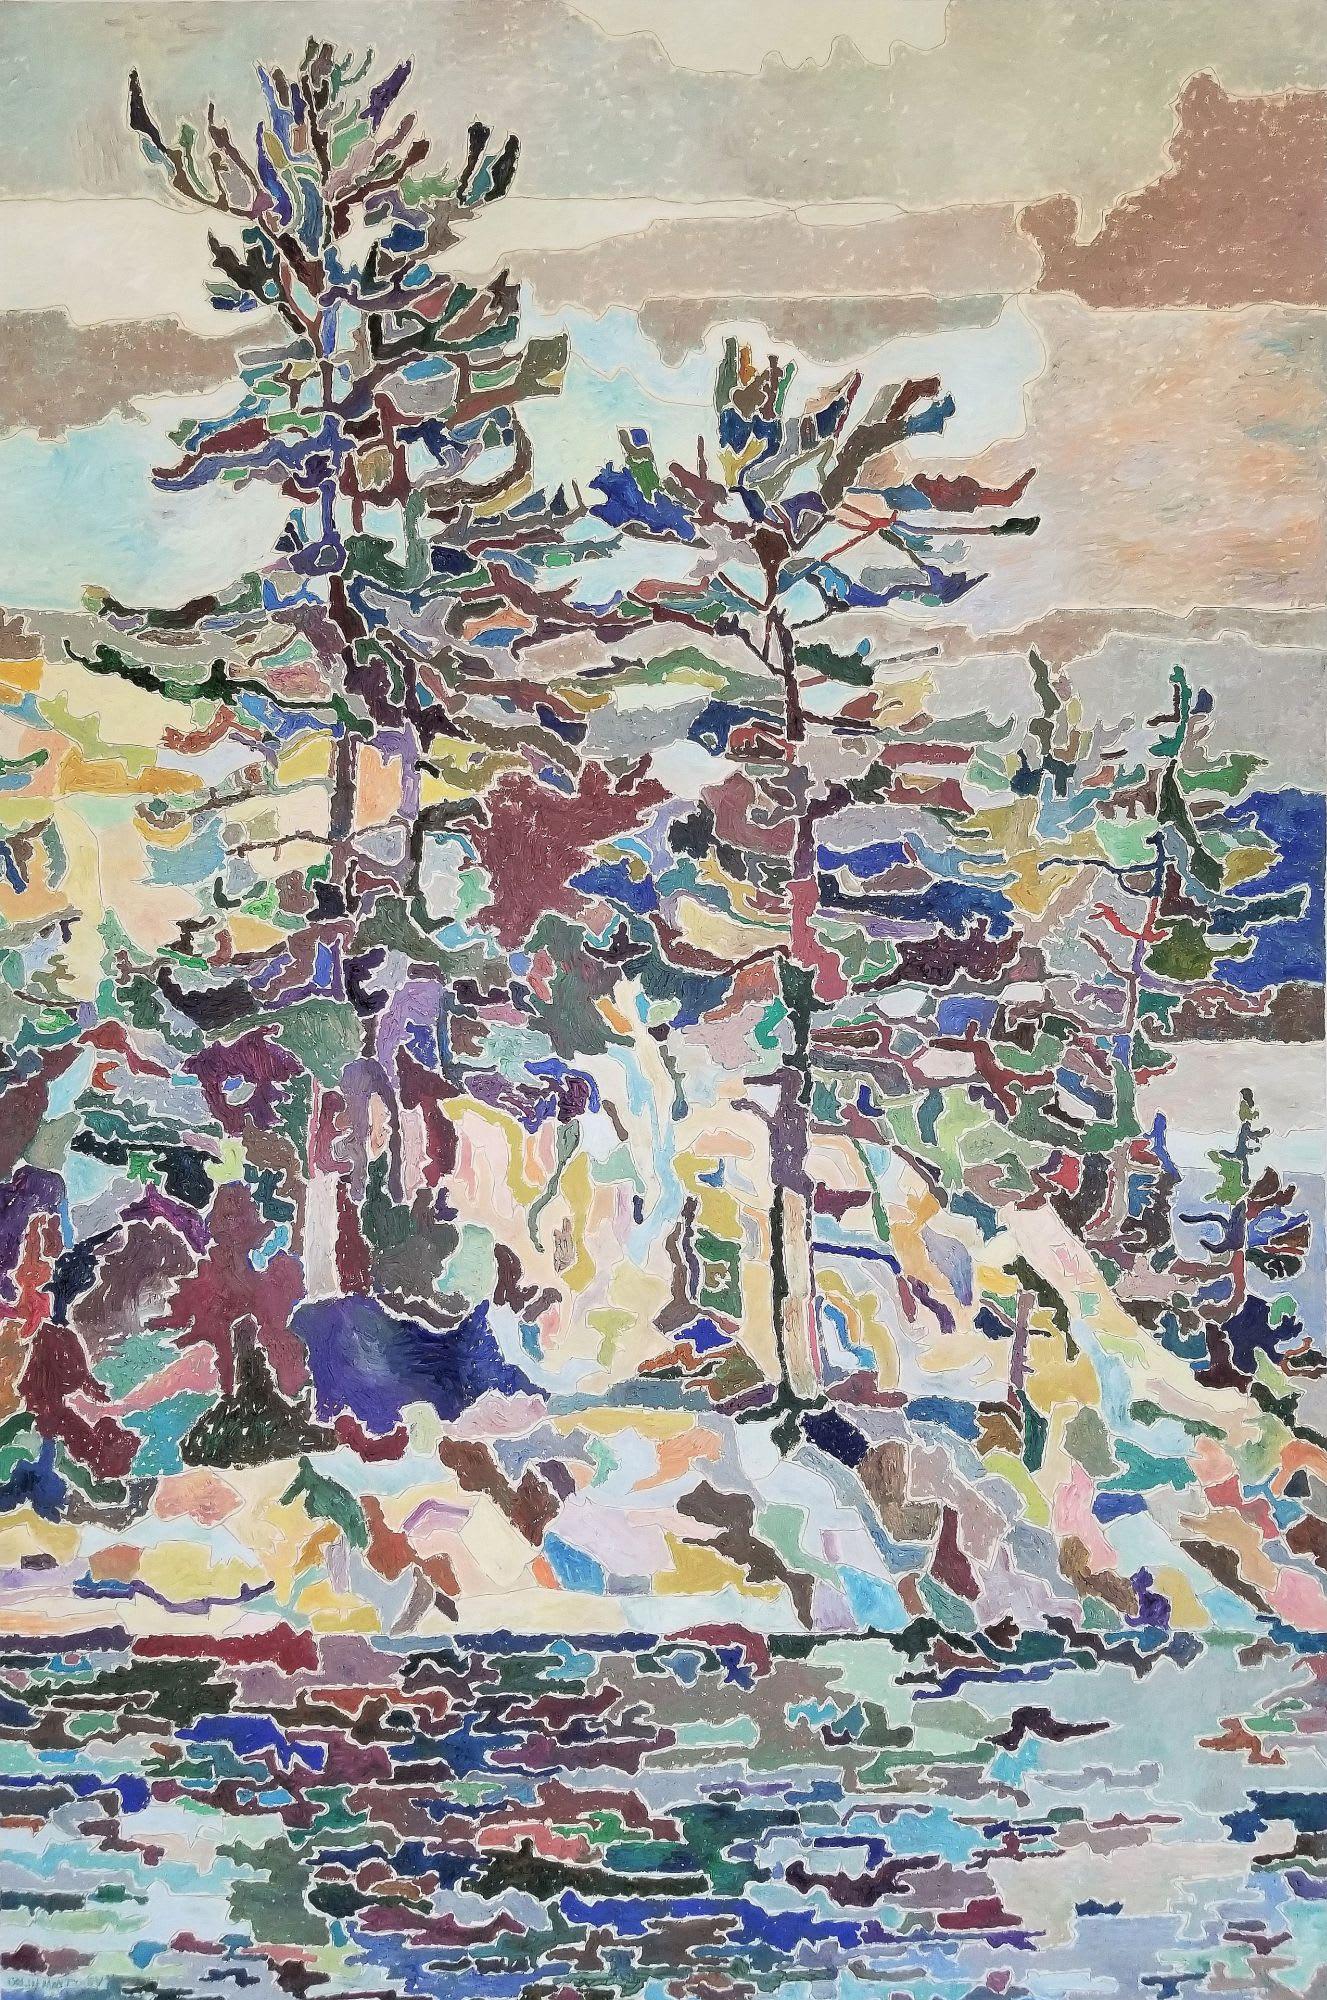 'Breezy Day' by Orlin Mantchev at Gallery 133